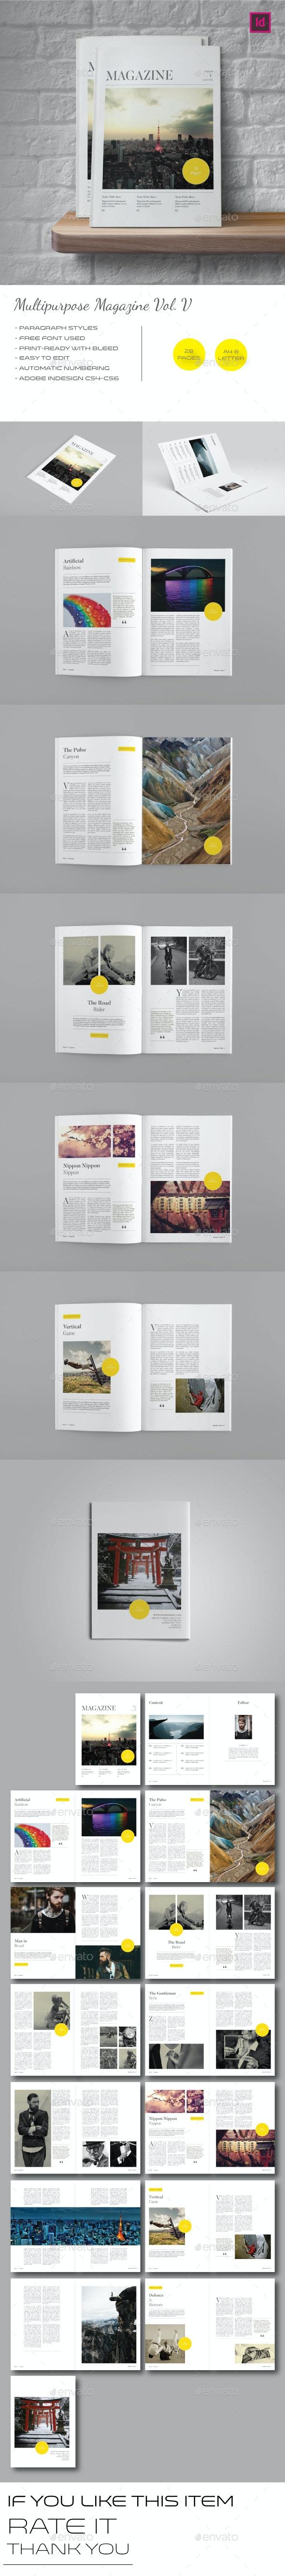 Multipurpose Magazine Template Vol.V - Magazines Print Templates